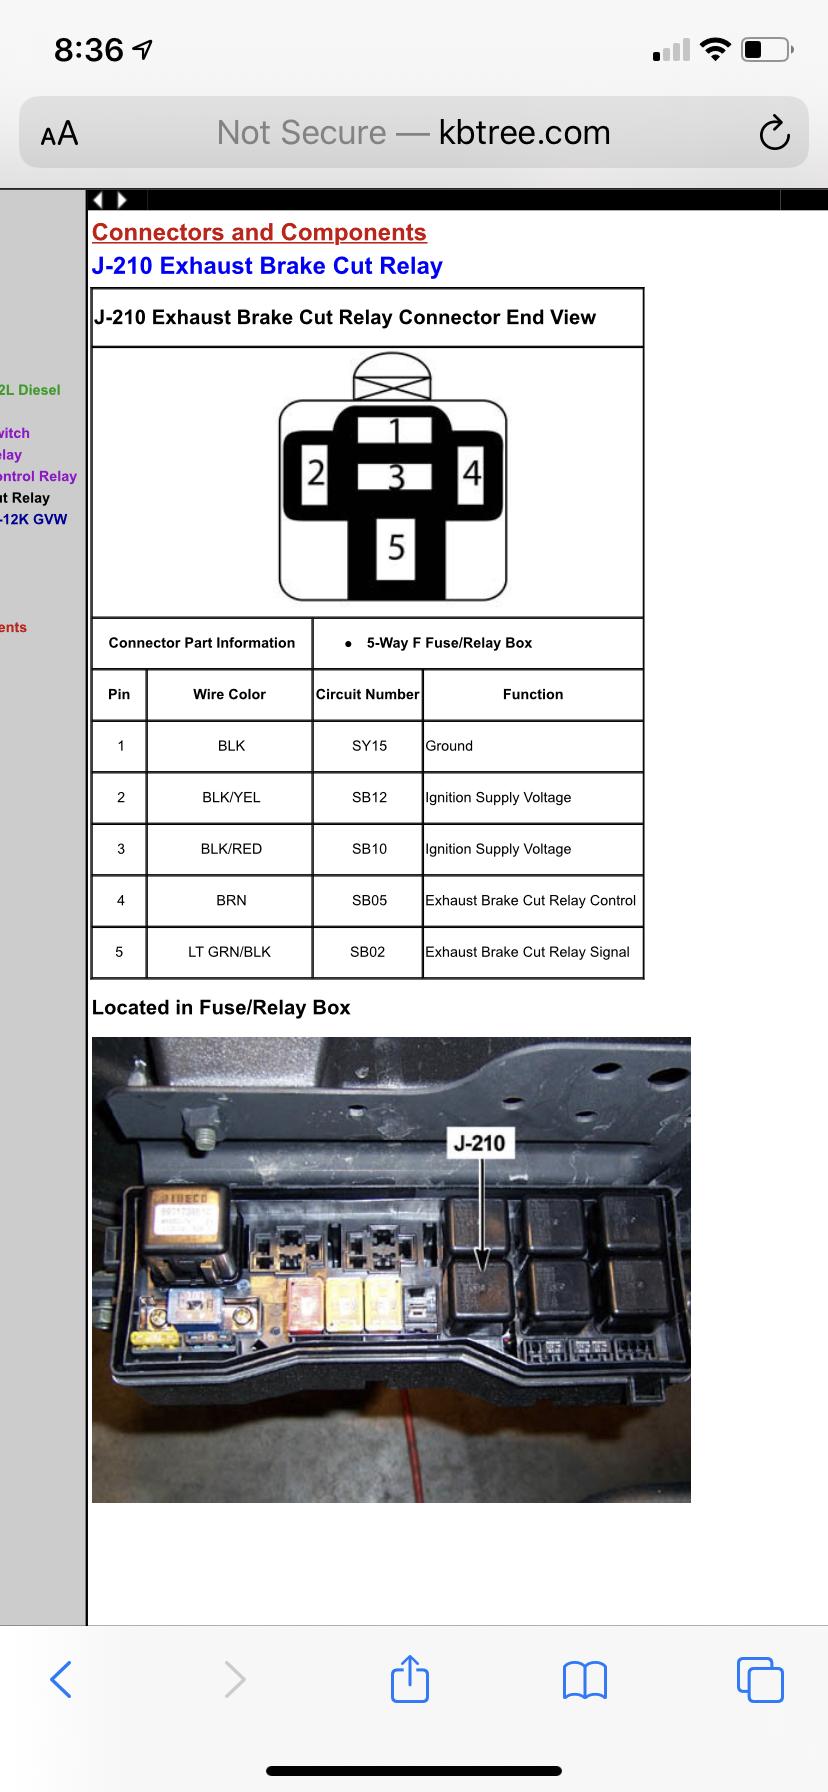 diagram bing] 2004 isuzu npr fuse box diagram | copper conductor wiring  decorpanel.it